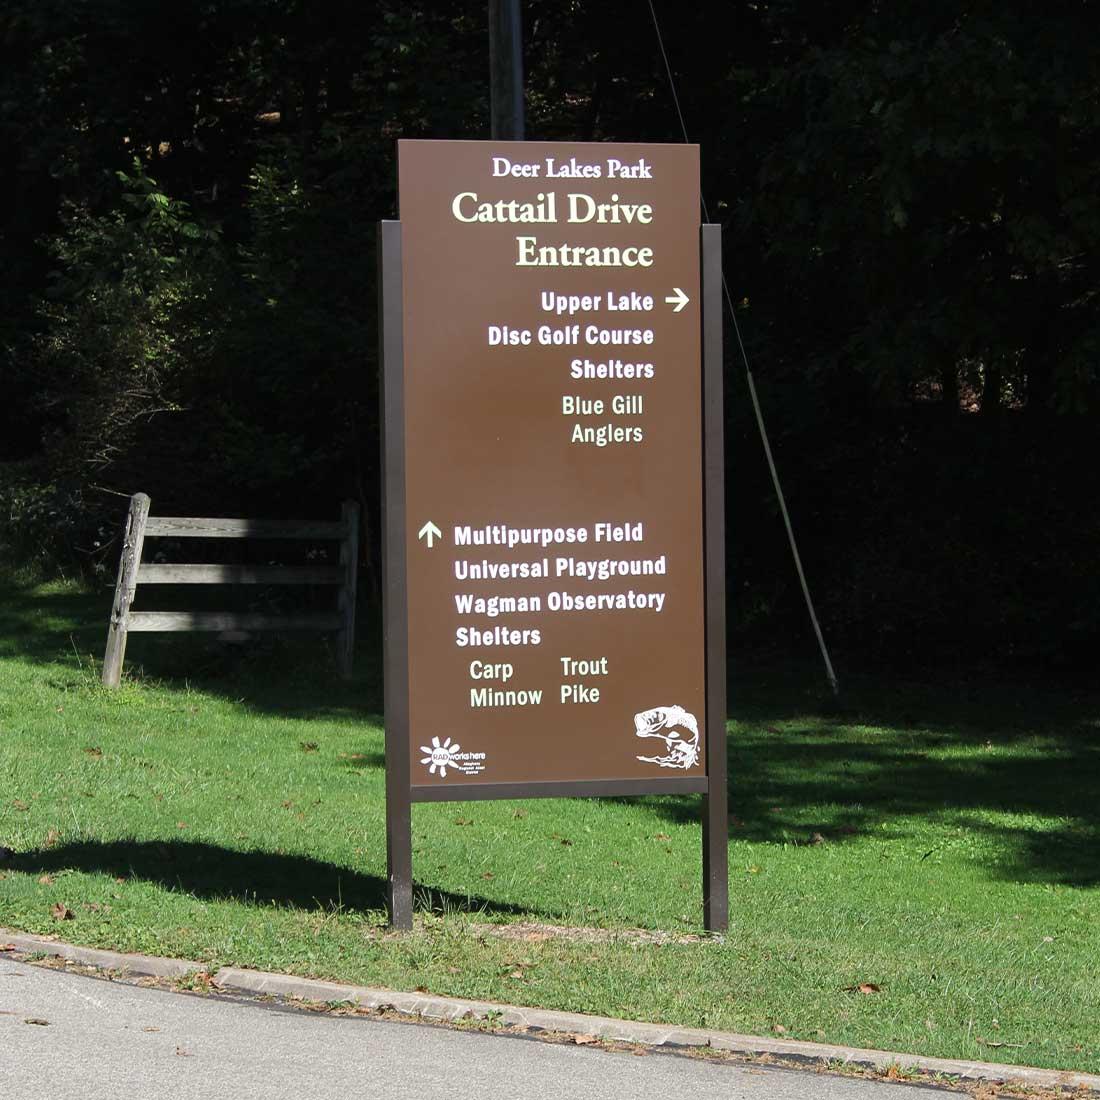 Deer Lakes Park sign